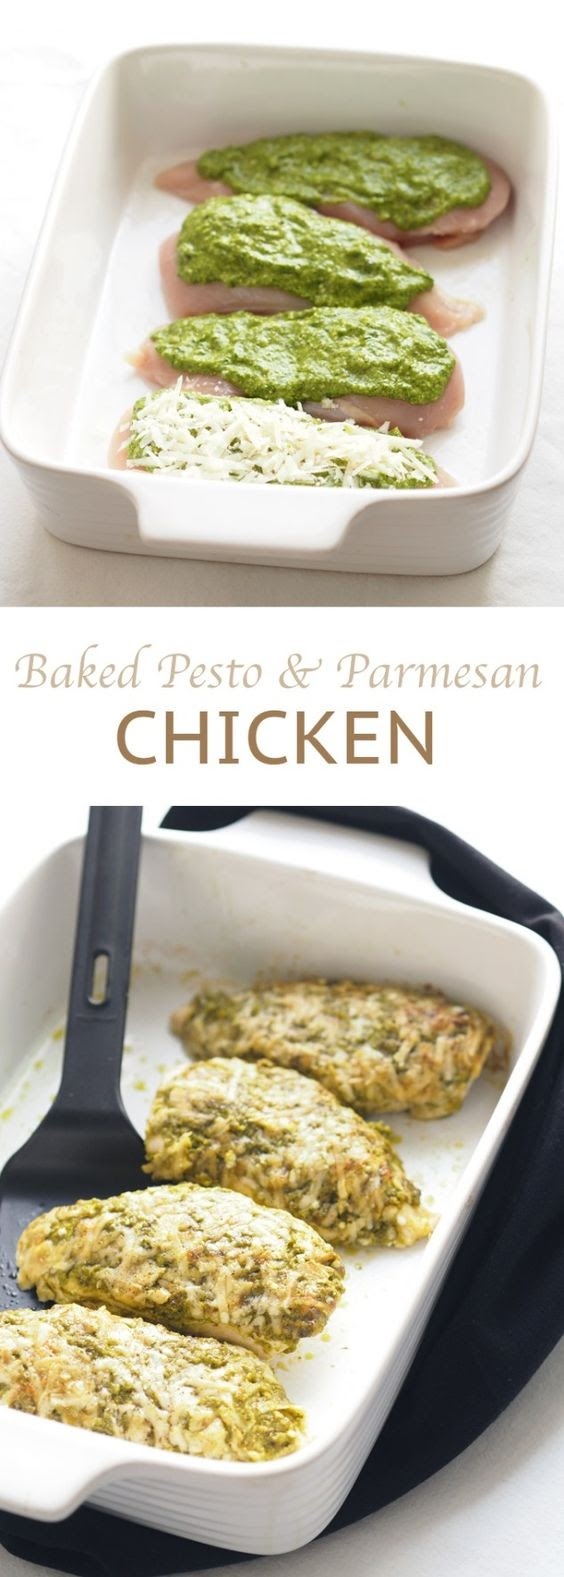 Baked pesto parmesan chicken